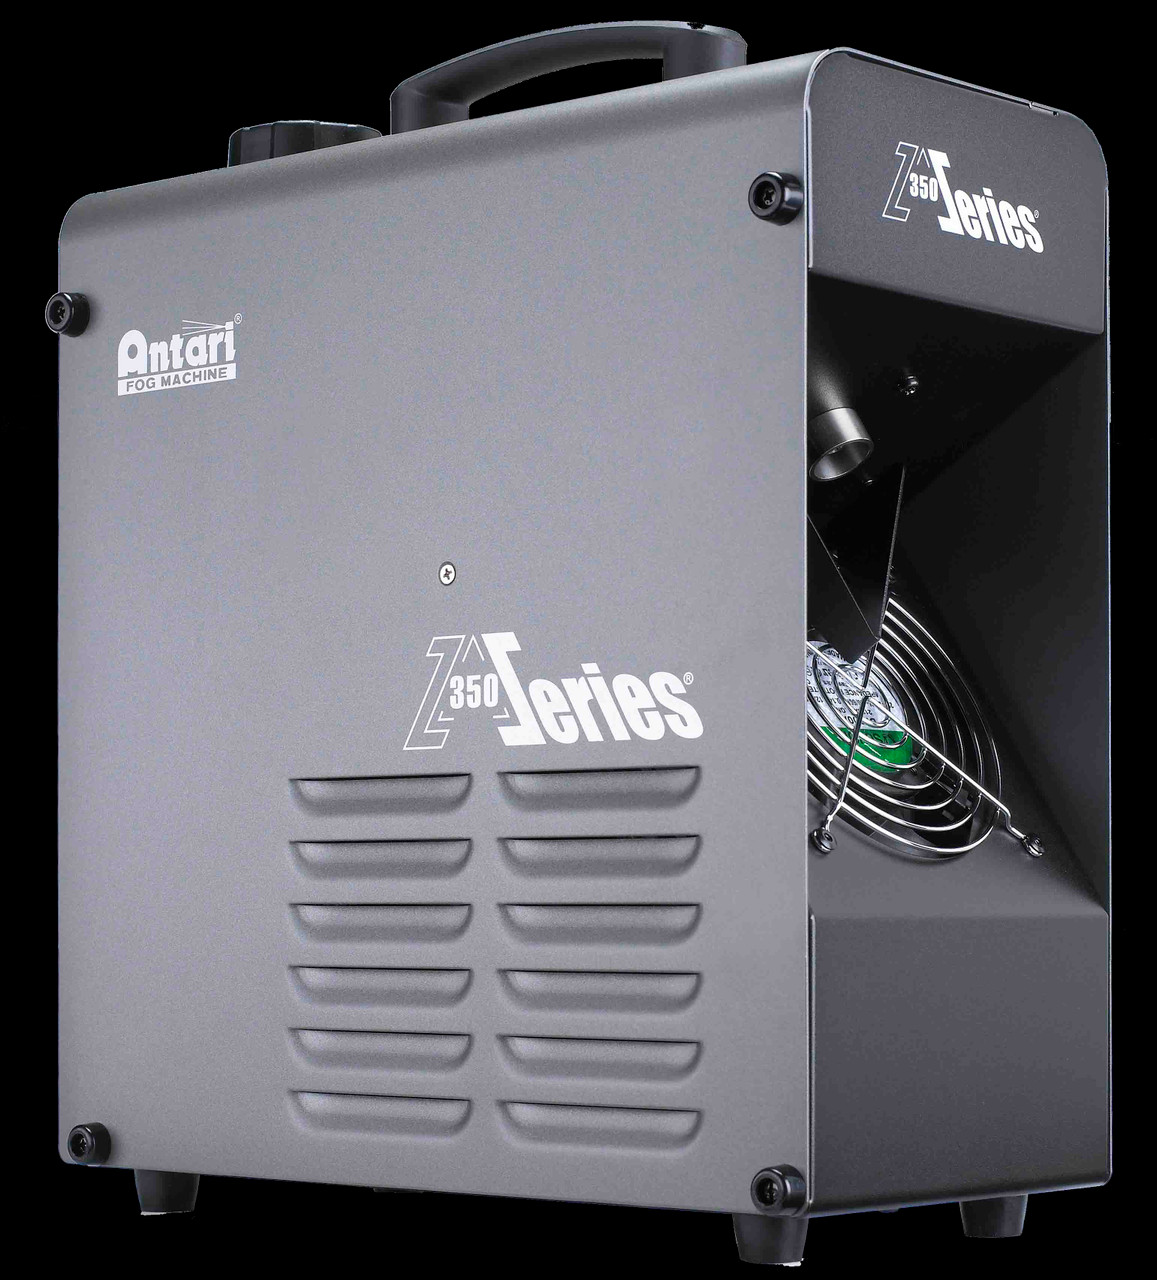 Antari Z-350 Water Based Fazer w/ DMX